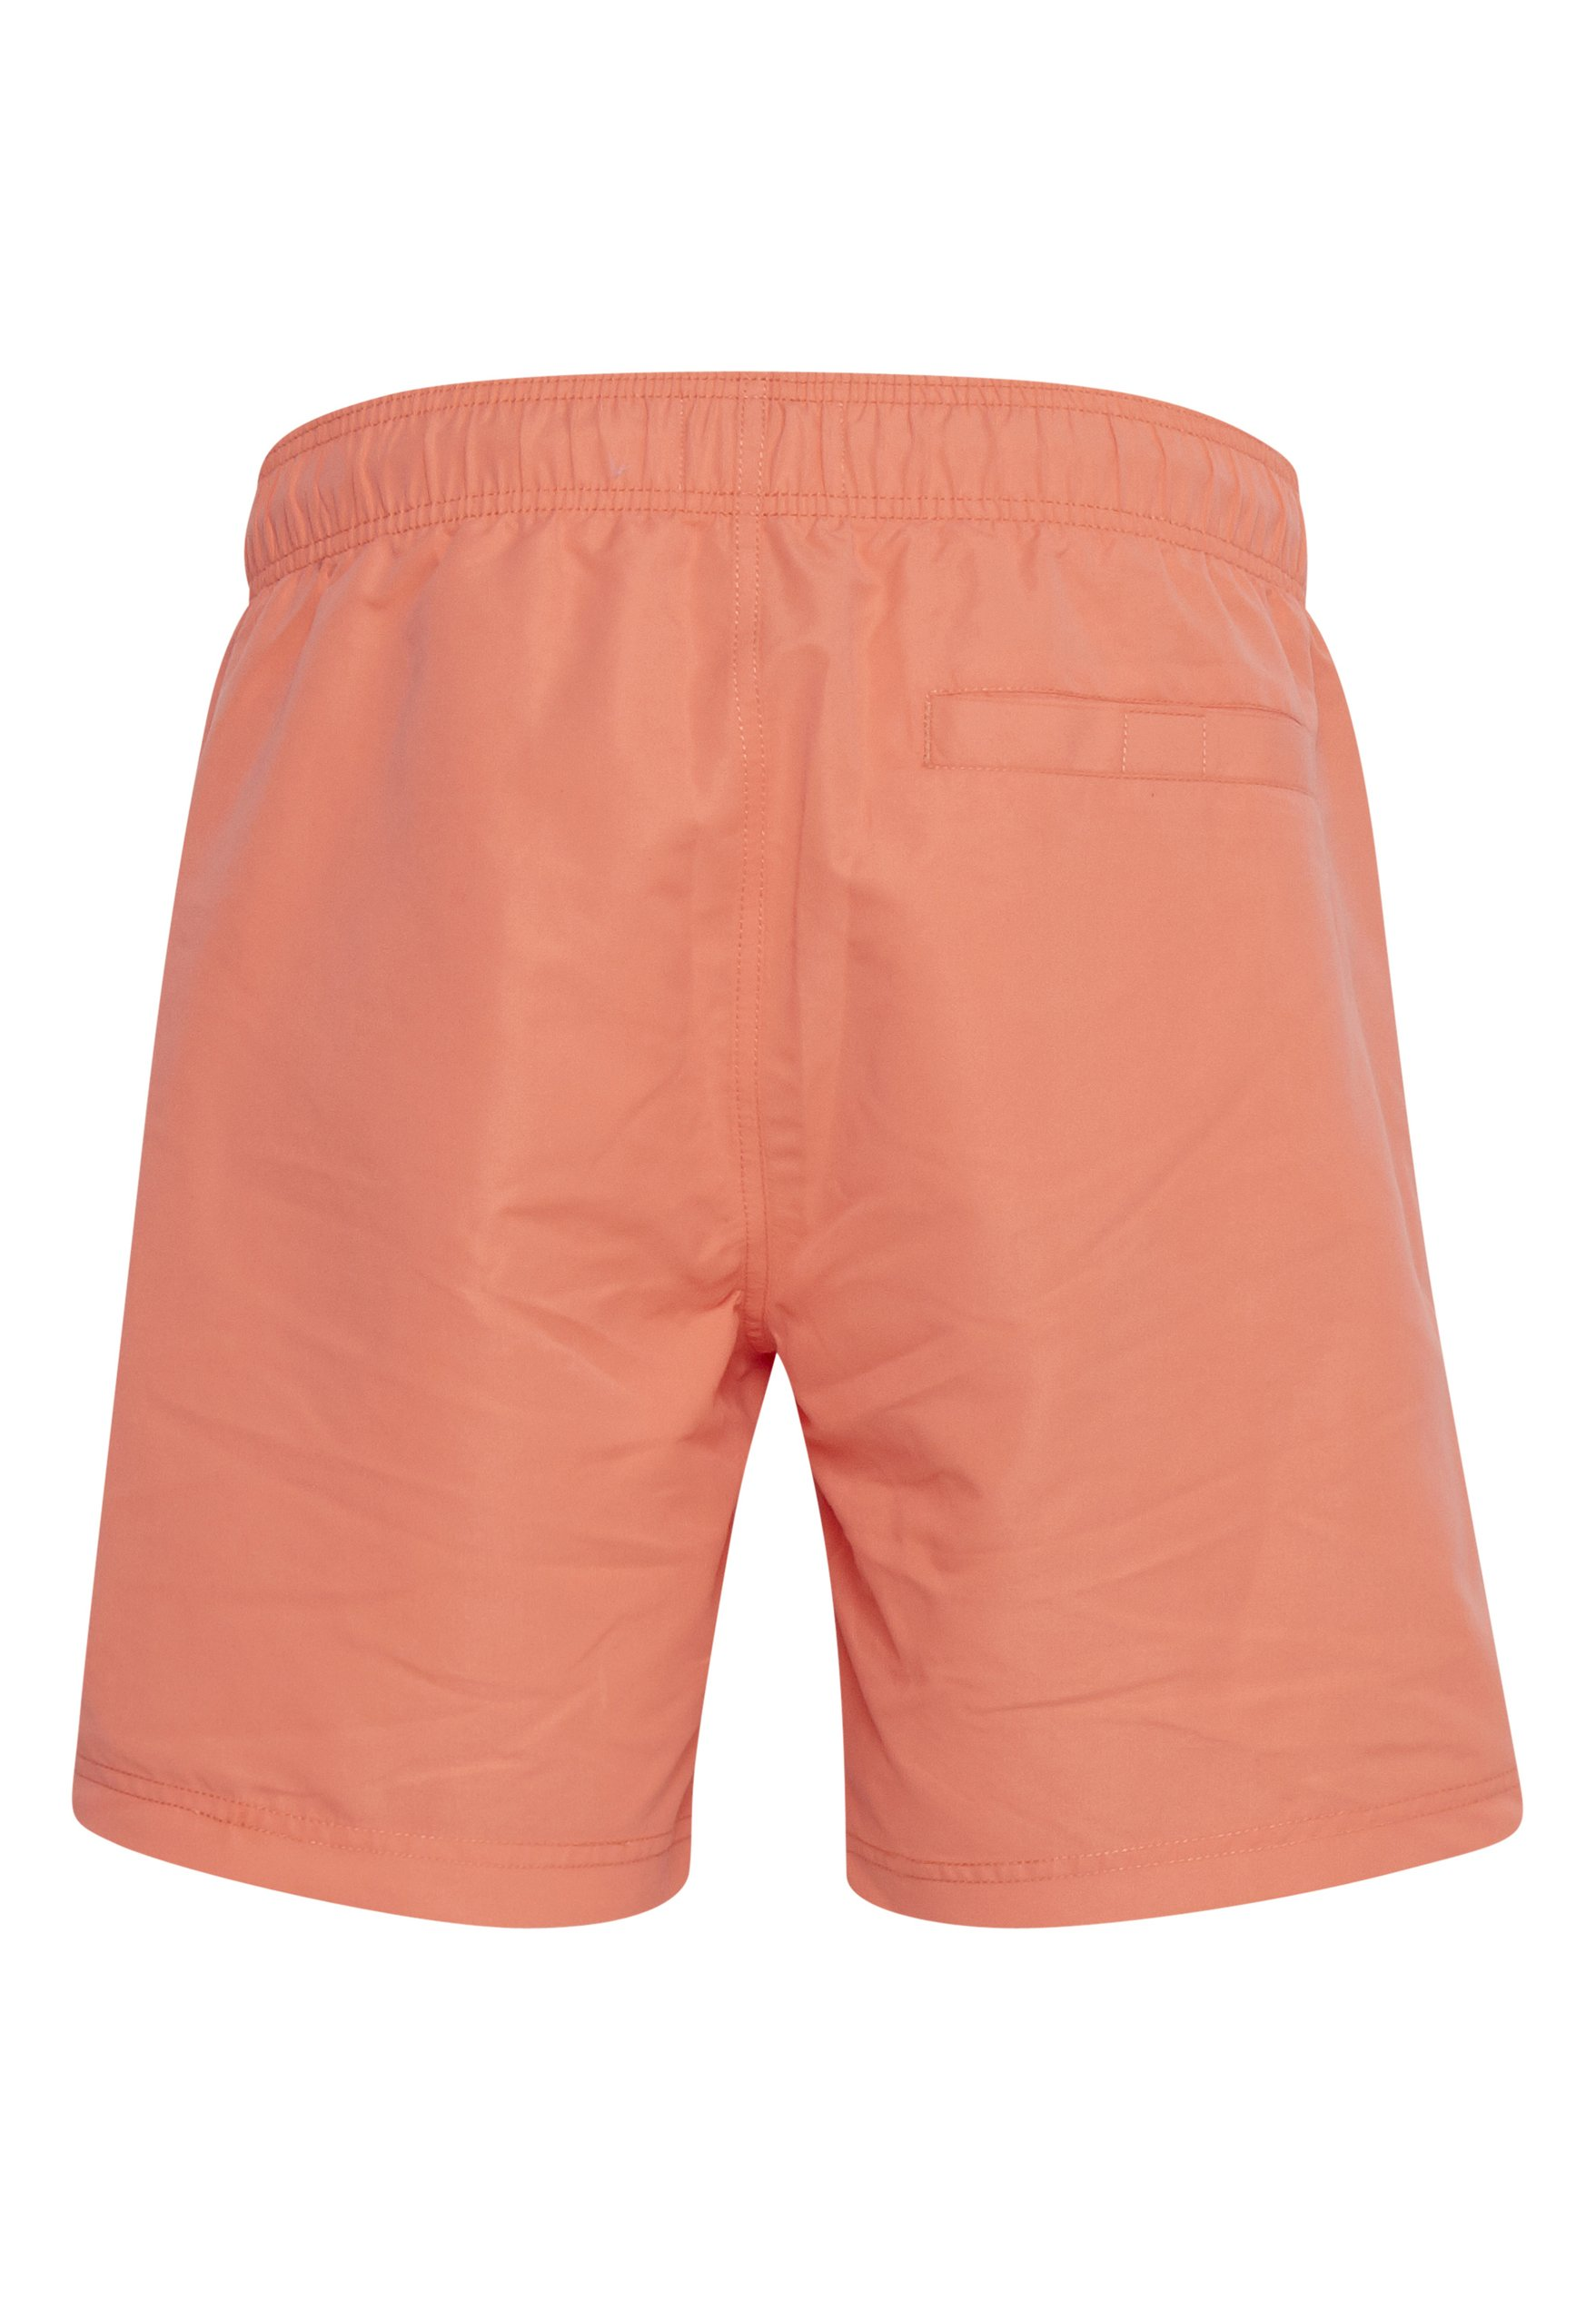 Blend Swimwear - Szorty Kąpielowe Living Coral